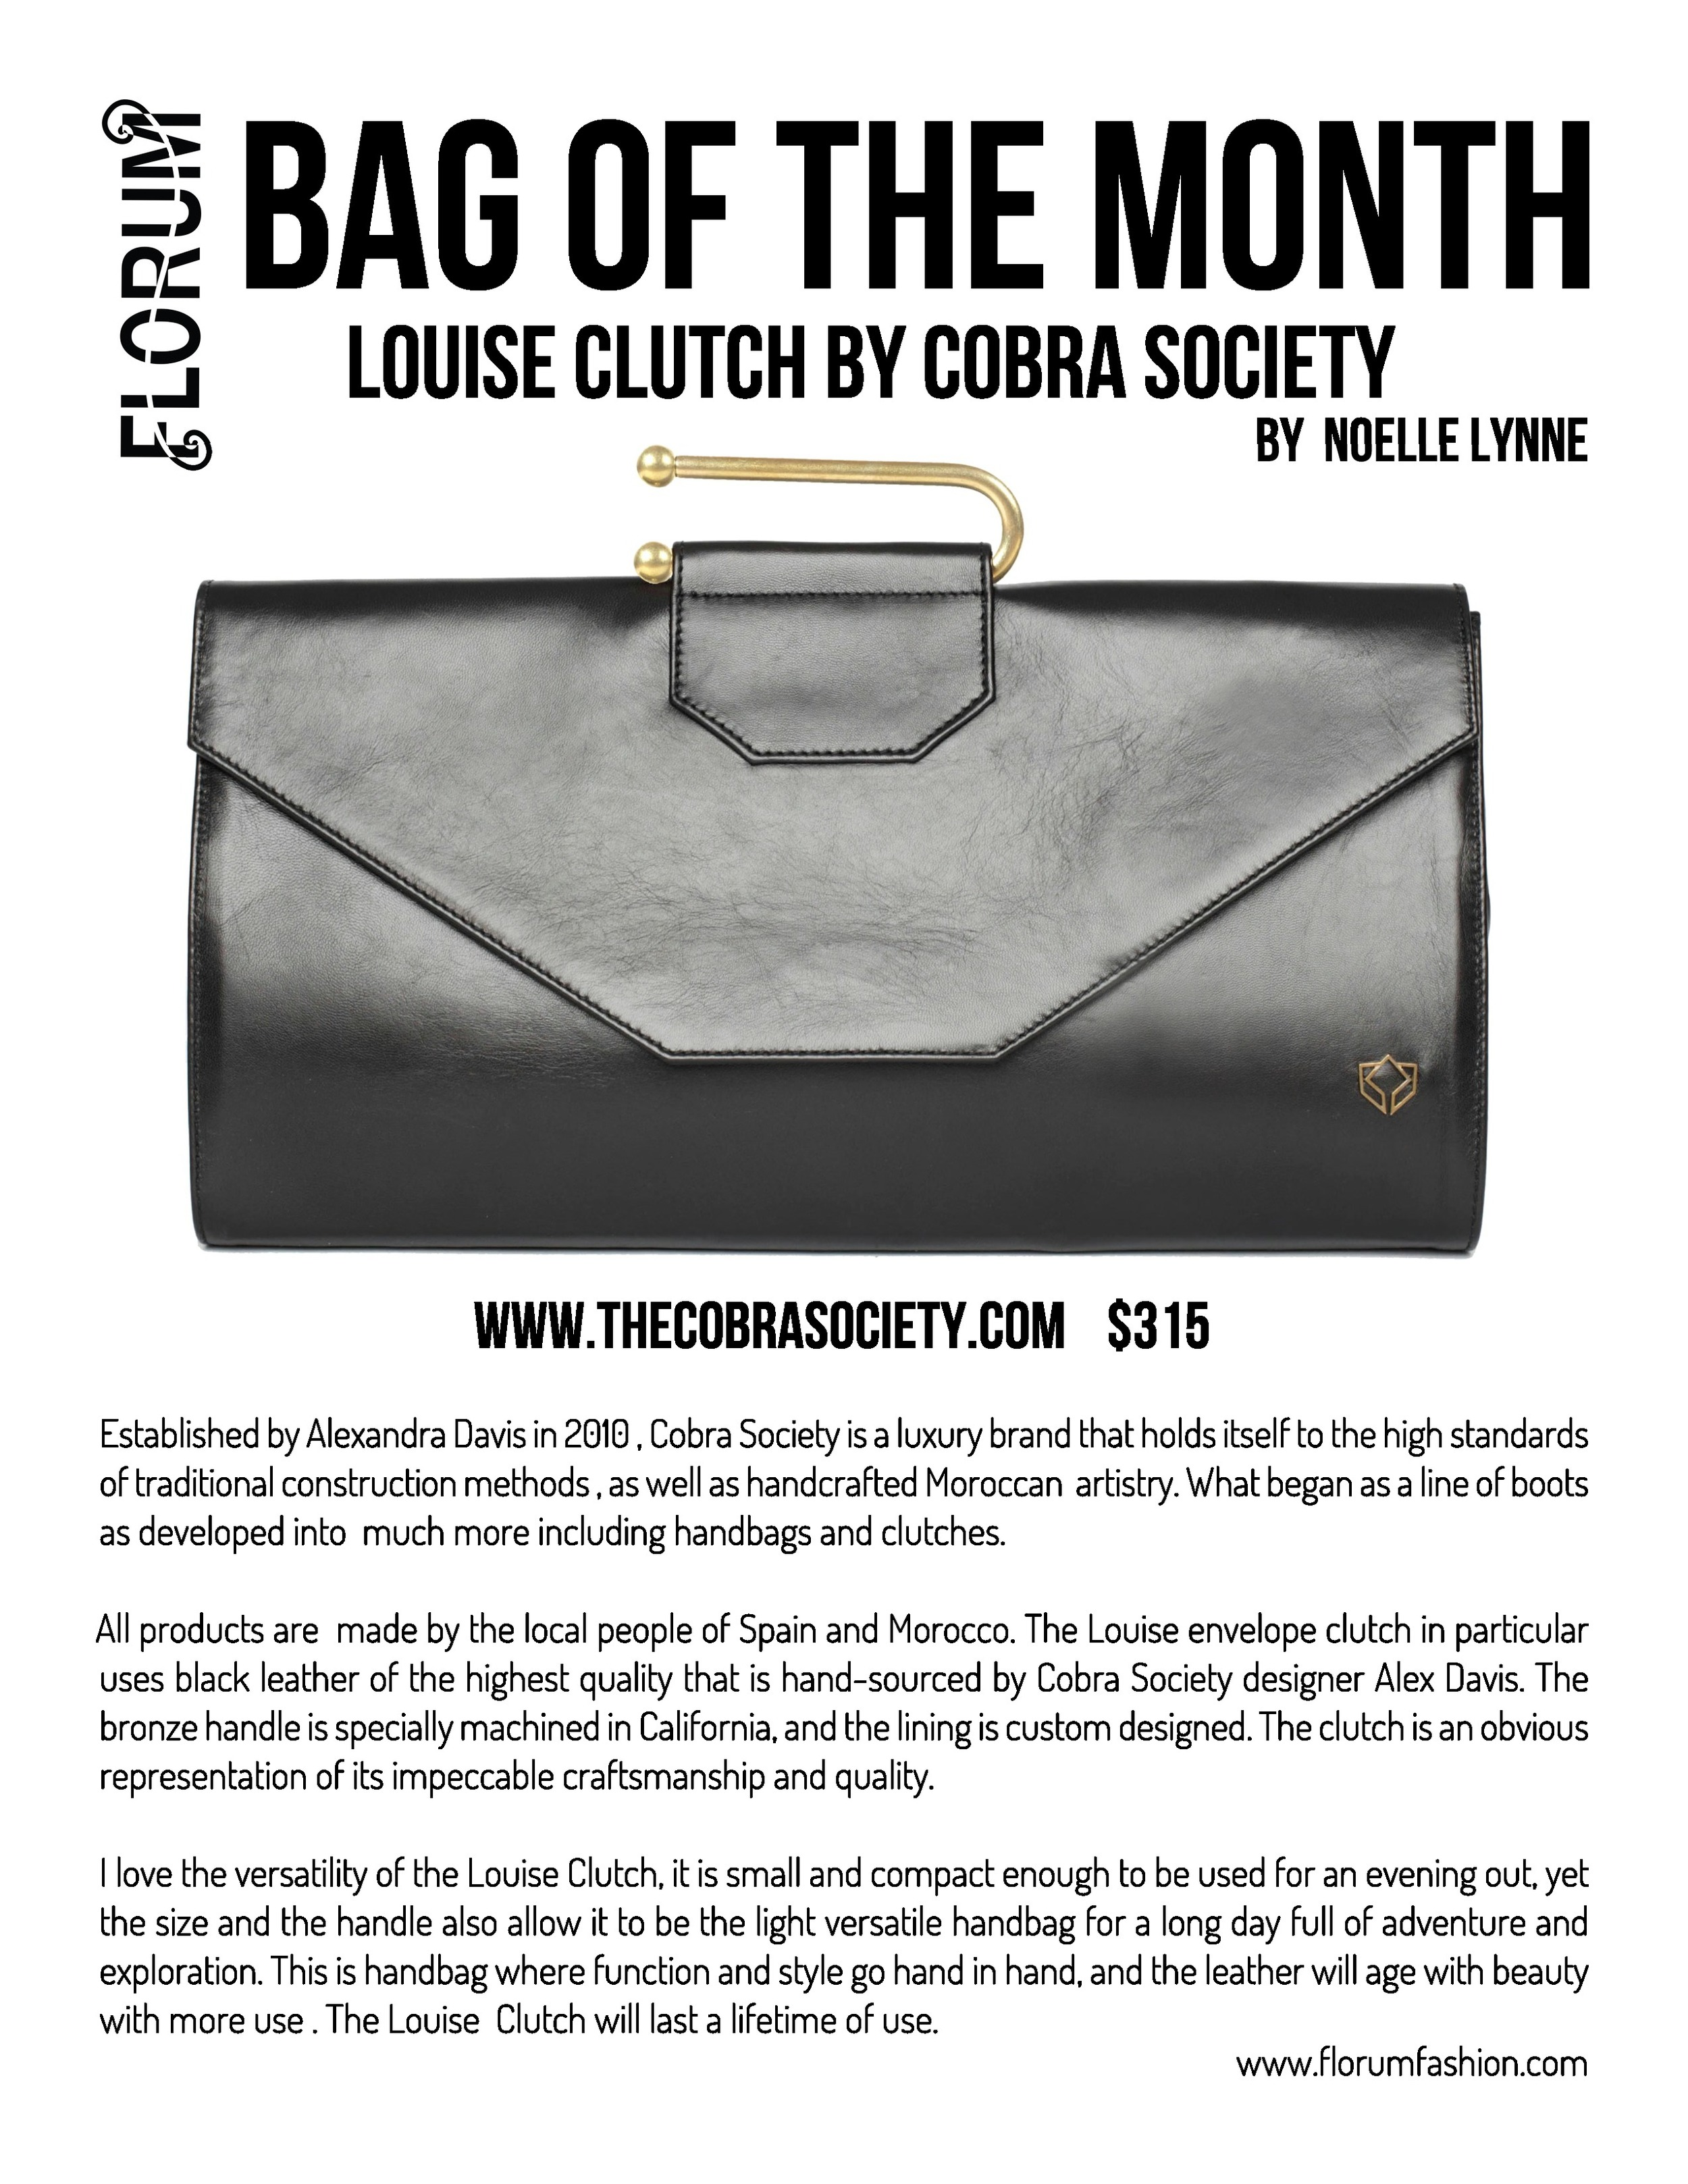 Florum Fashion Magazine Green Purse Ethical Clutch by Noelle Lynneq